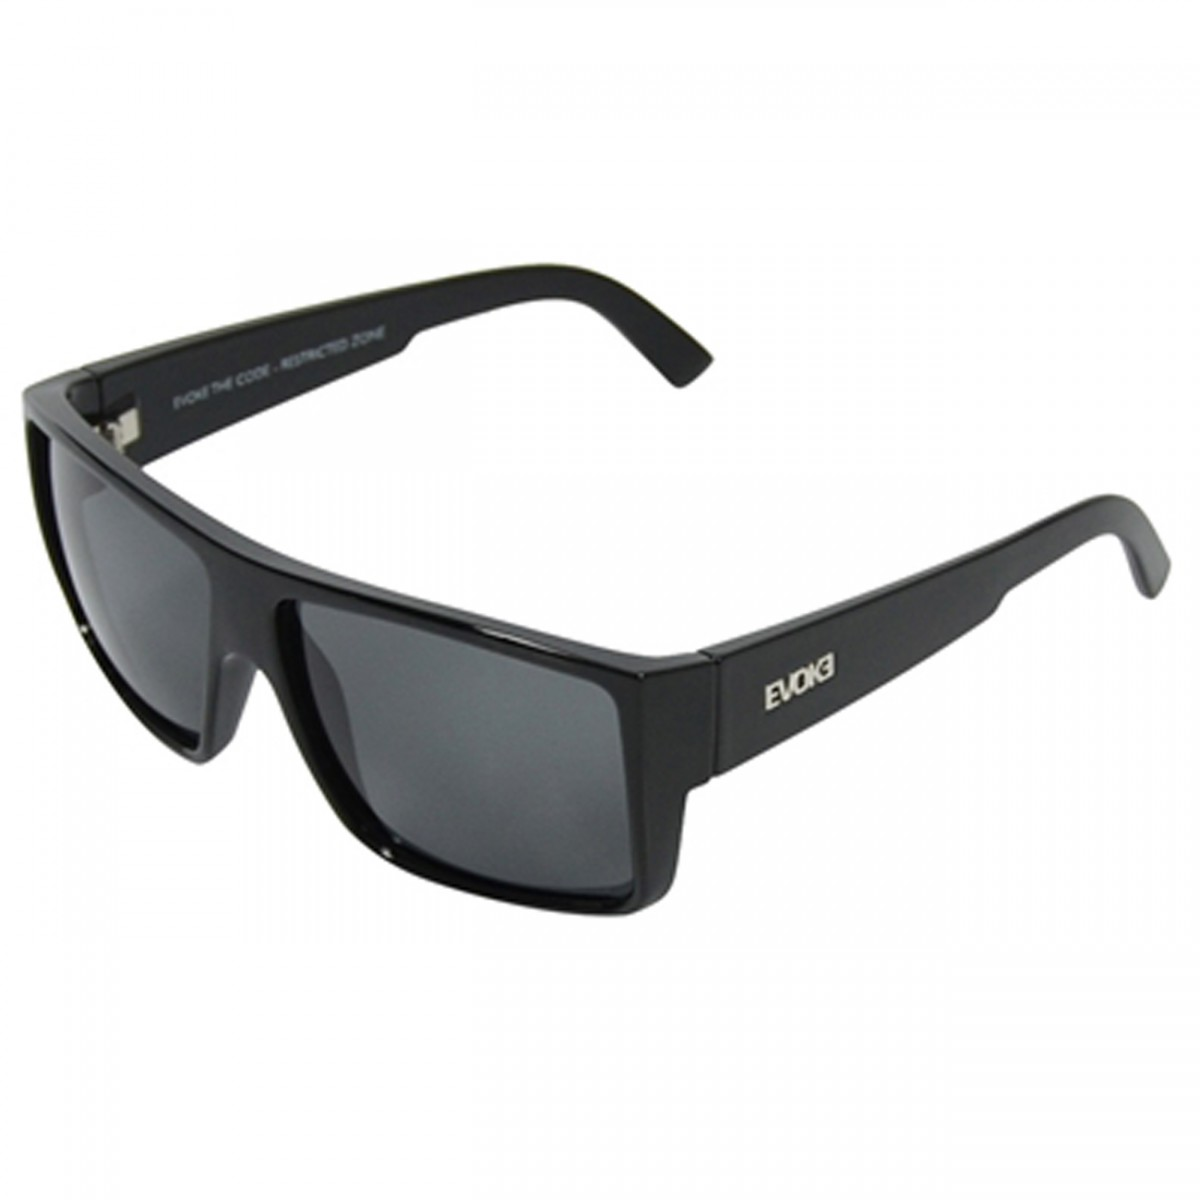 a6320be18dc3d Oculos Evoke The Code A11P - Black Matte Black Silver - Chuteira Nike